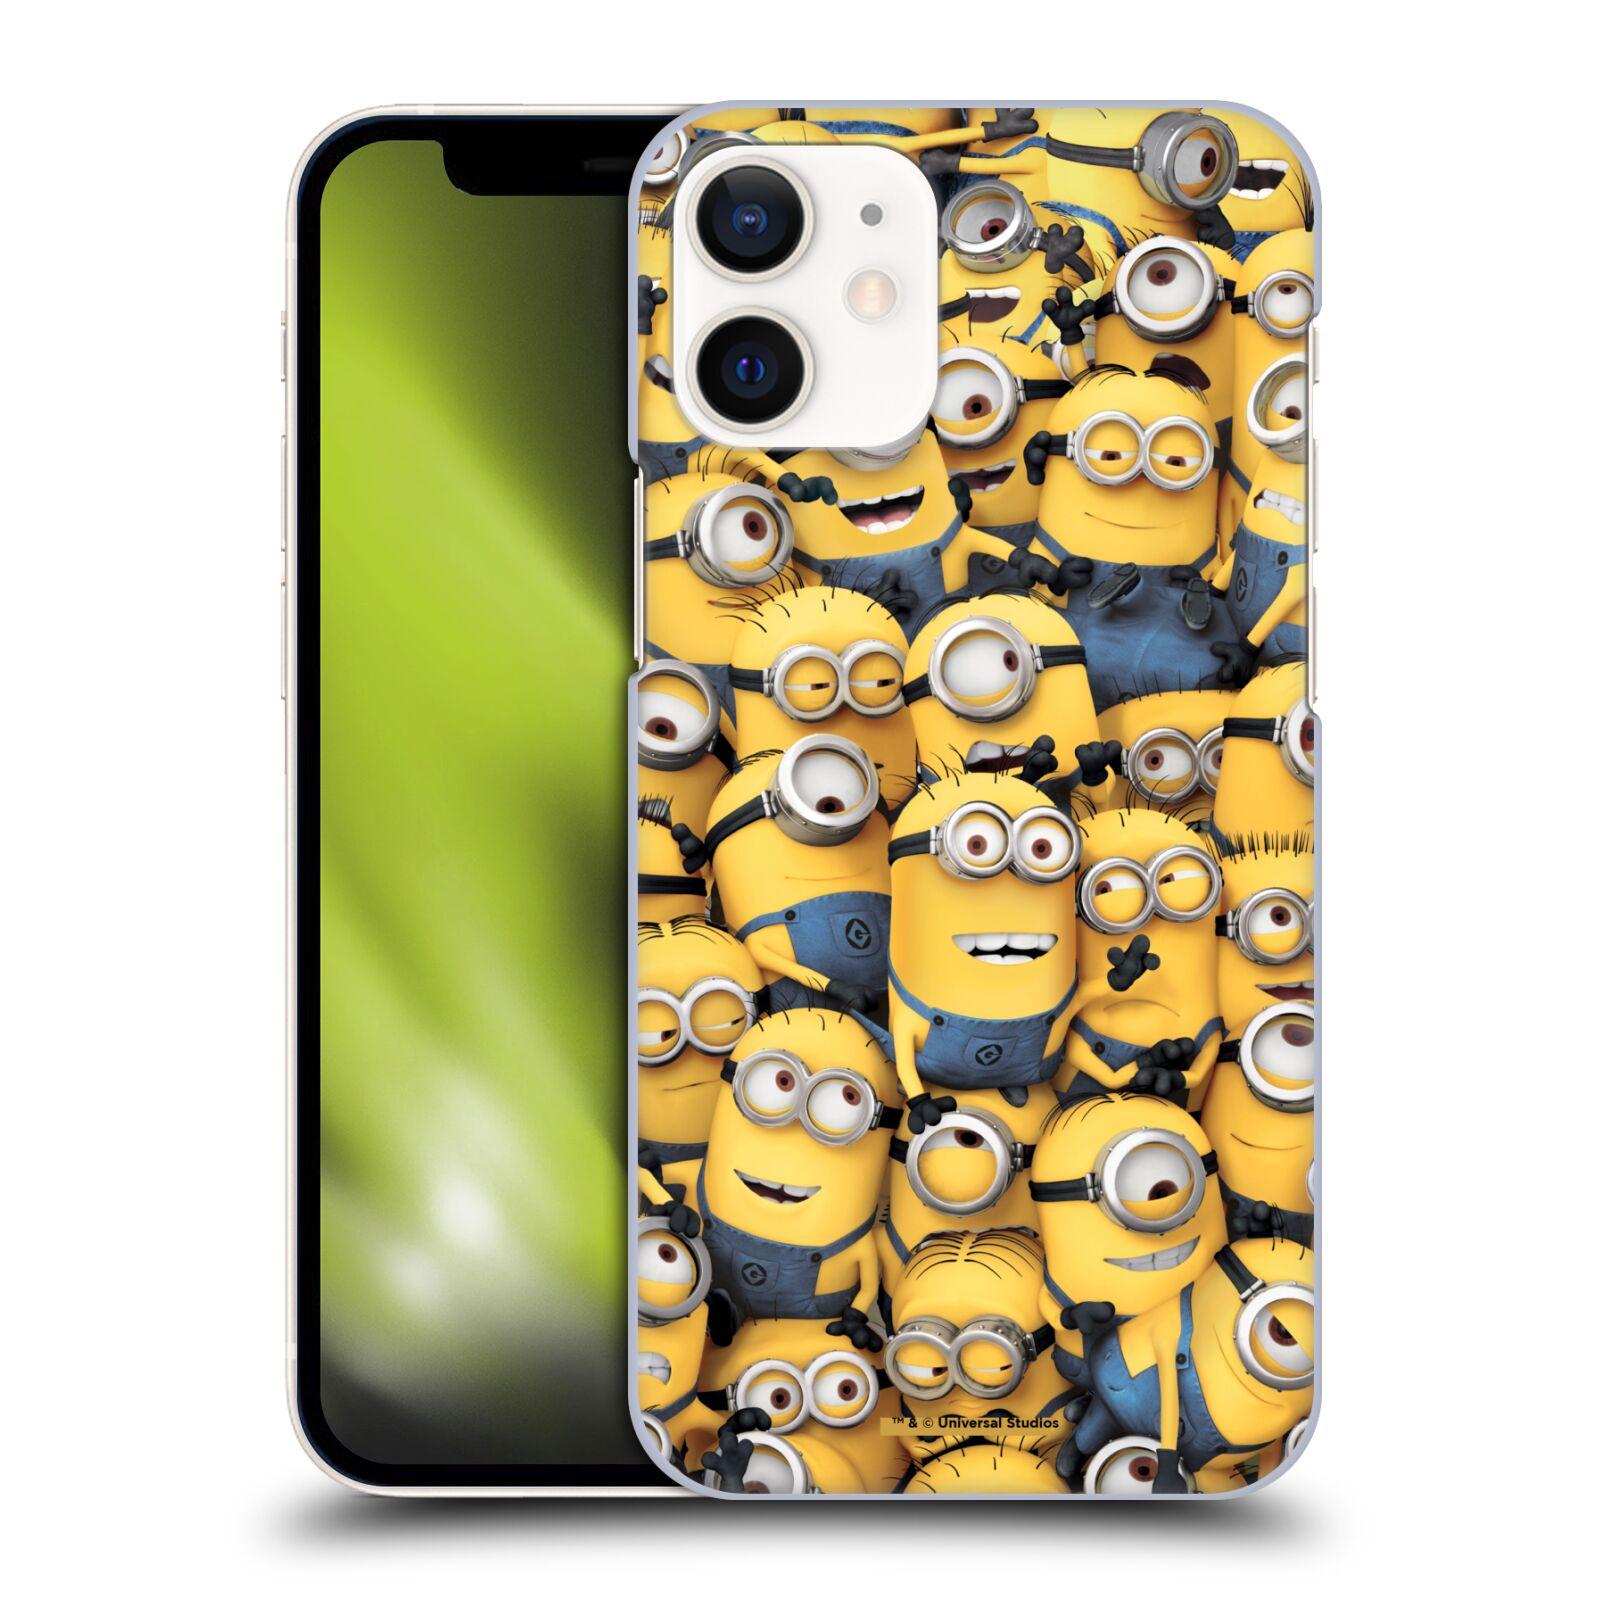 Plastové pouzdro na mobil Apple iPhone 12 Mini - Head Case - Mimoni všude z filmu Já, padouch - Despicable Me